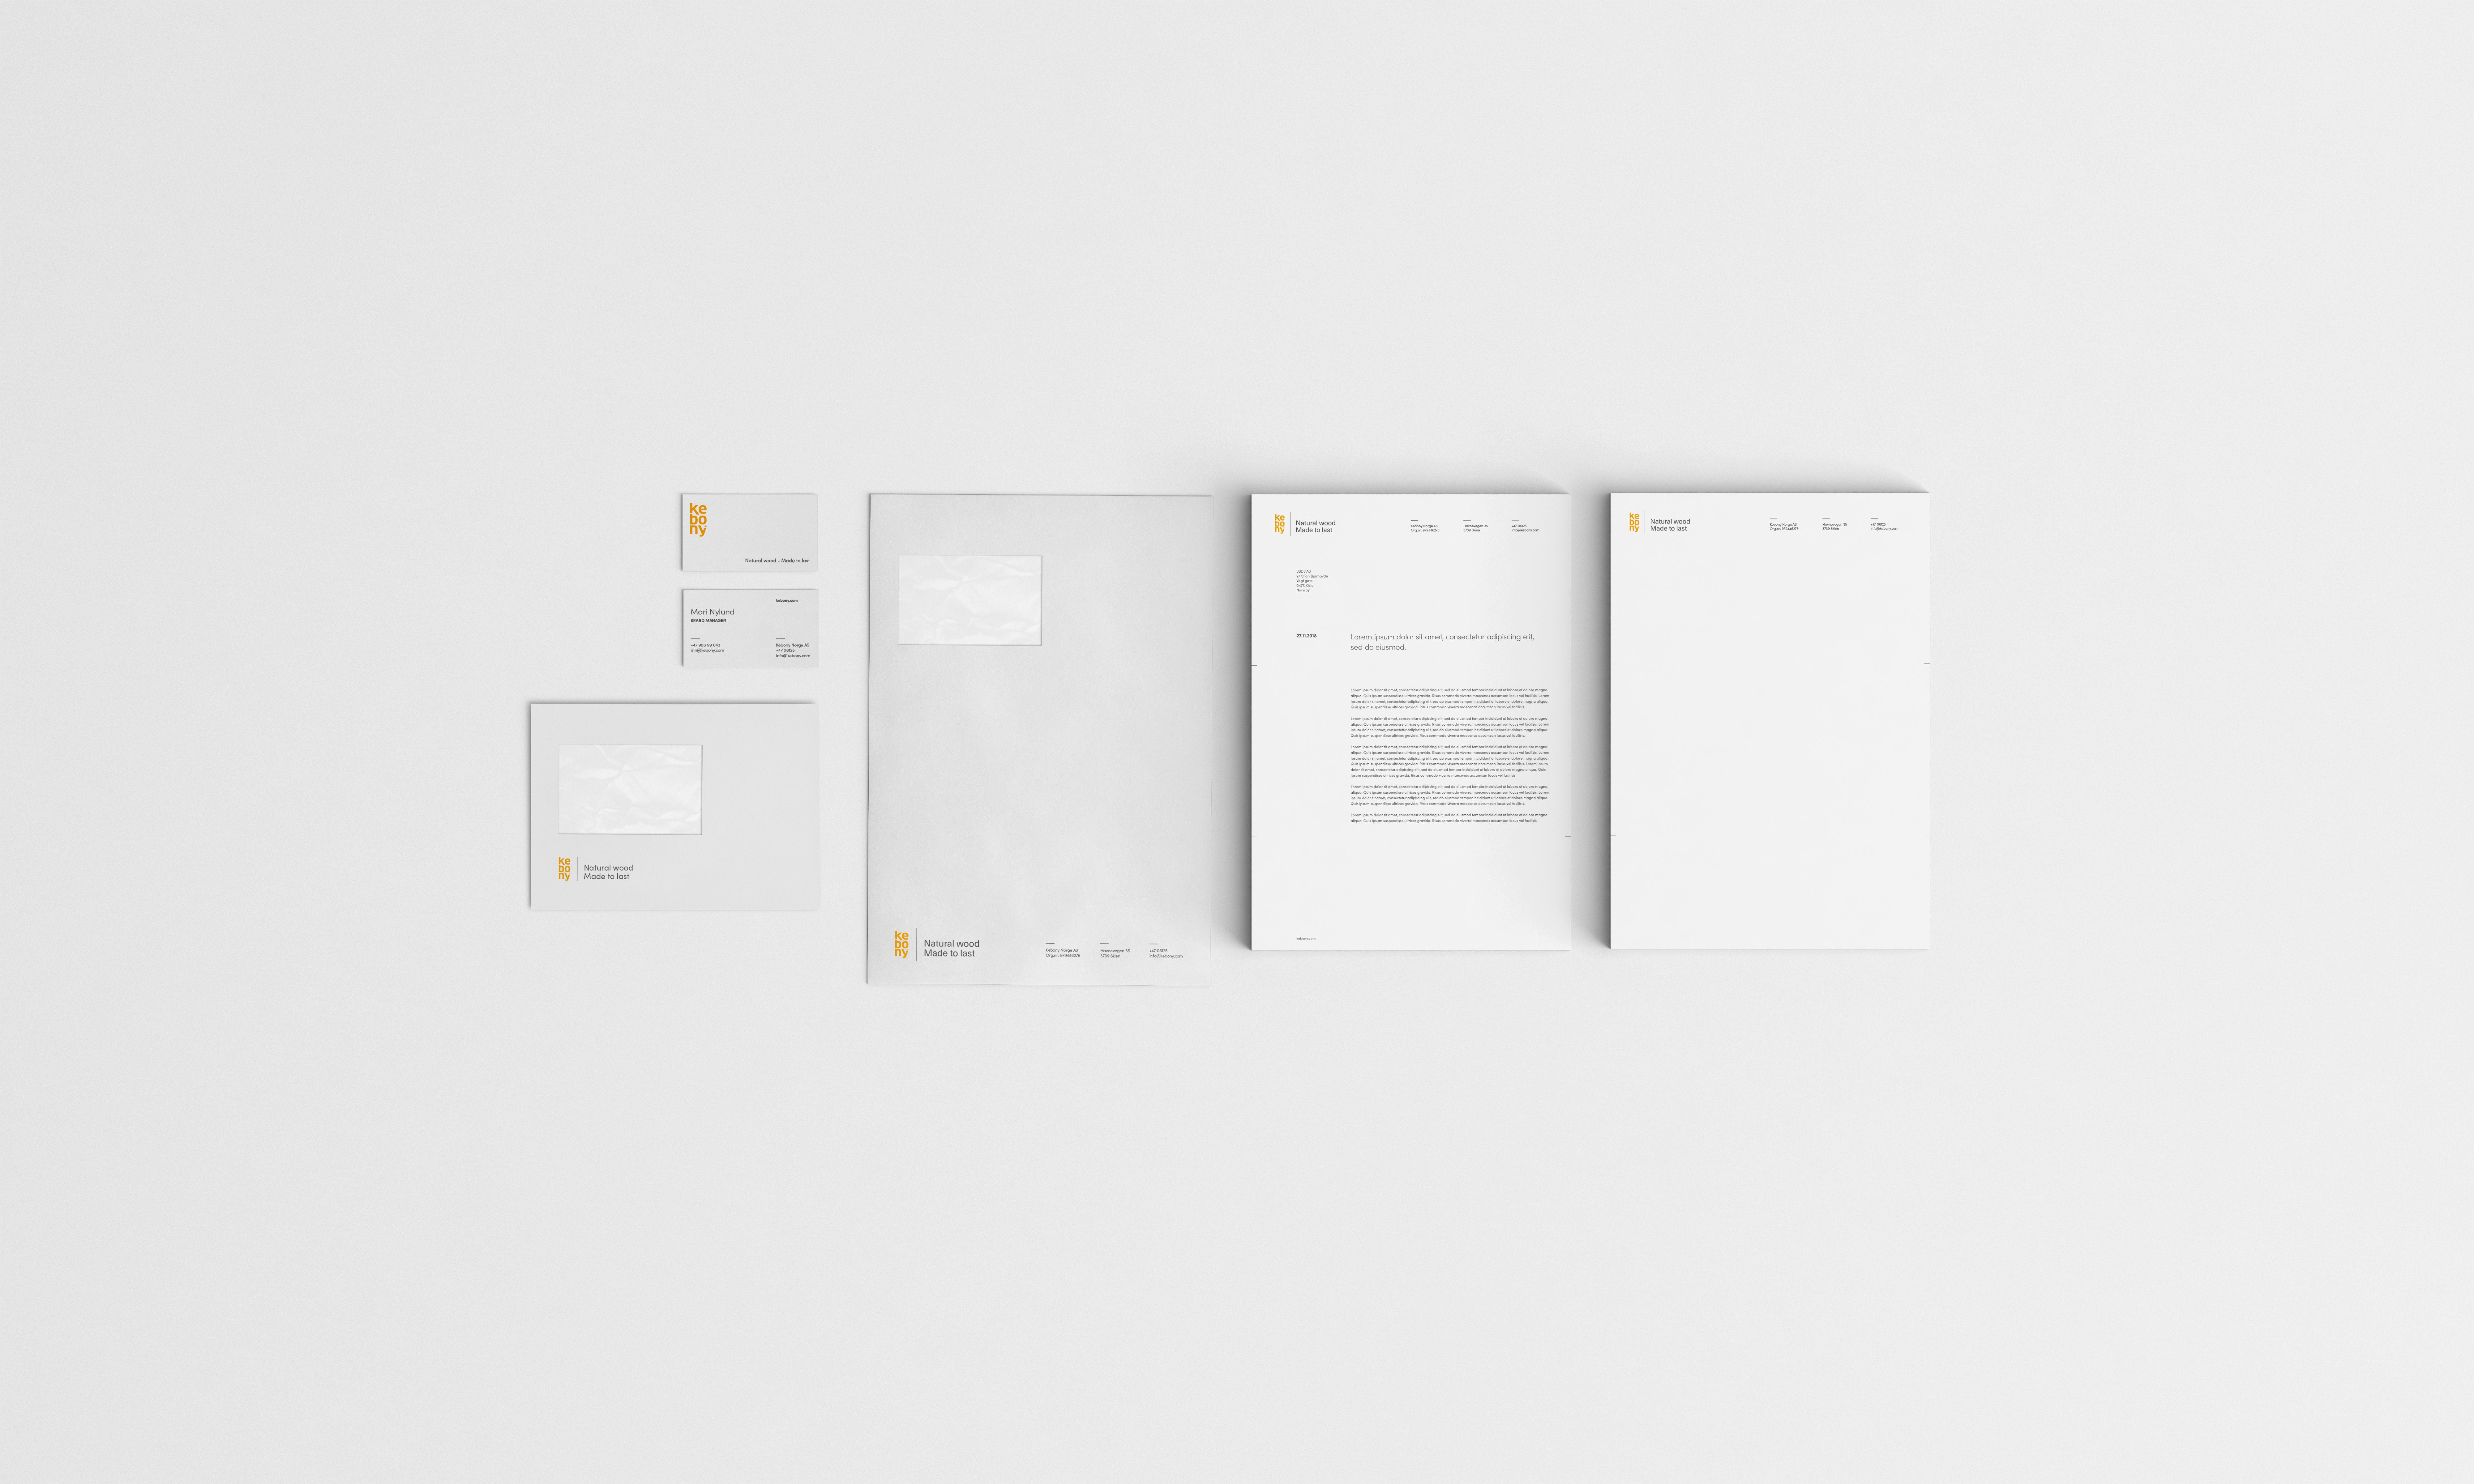 Kebony brand identity design by SBDS